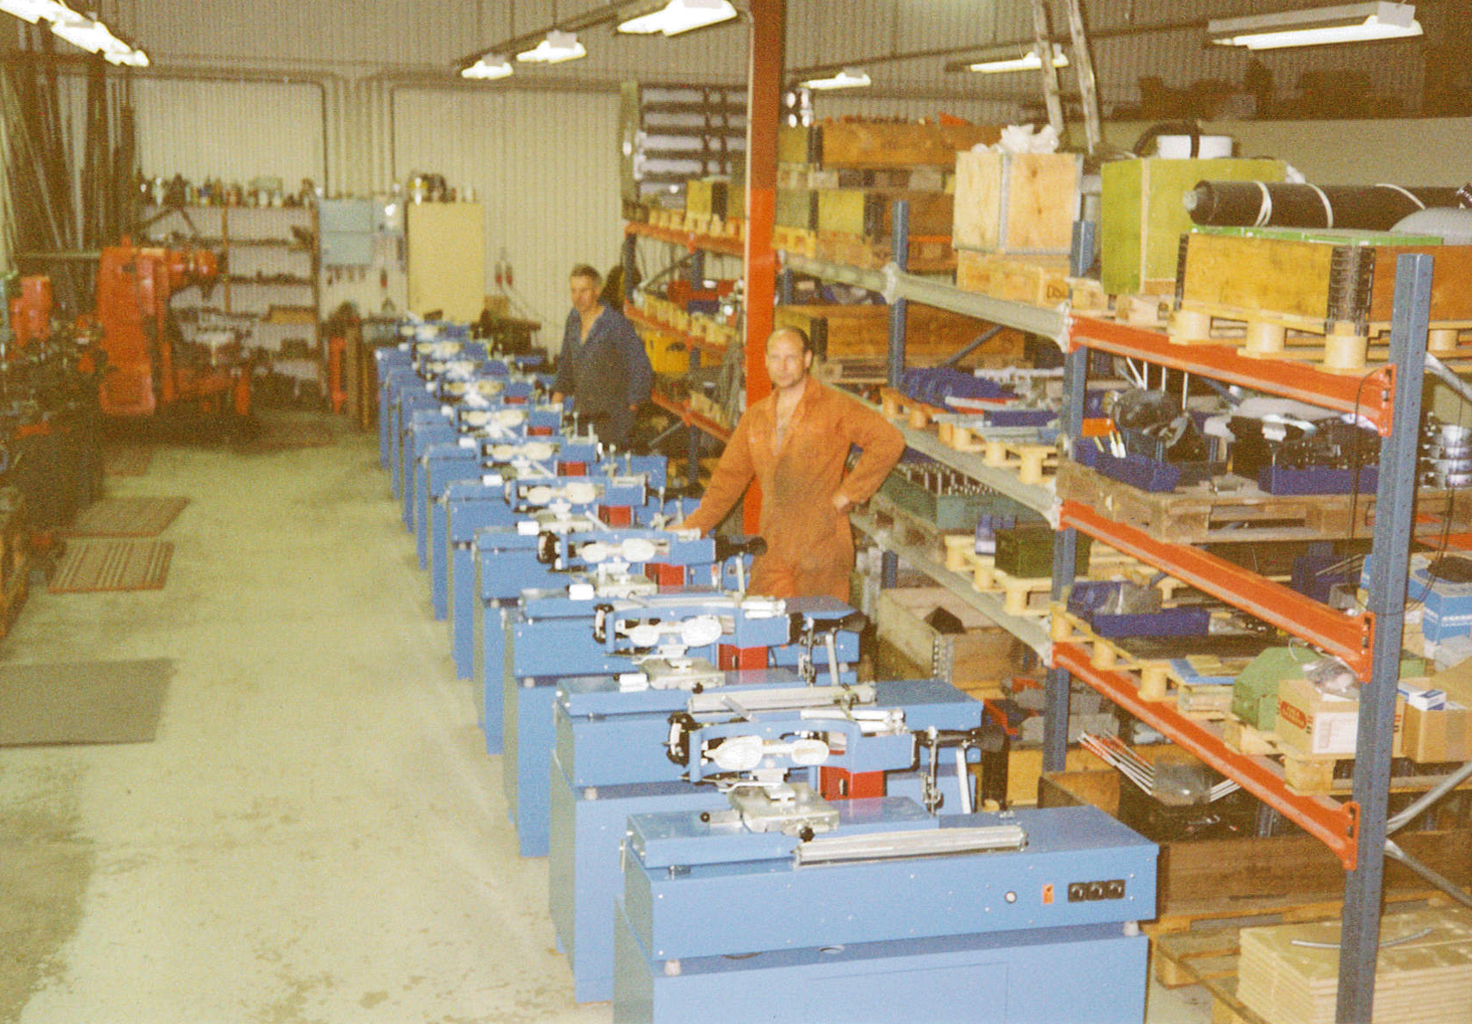 Production line of SSM 900